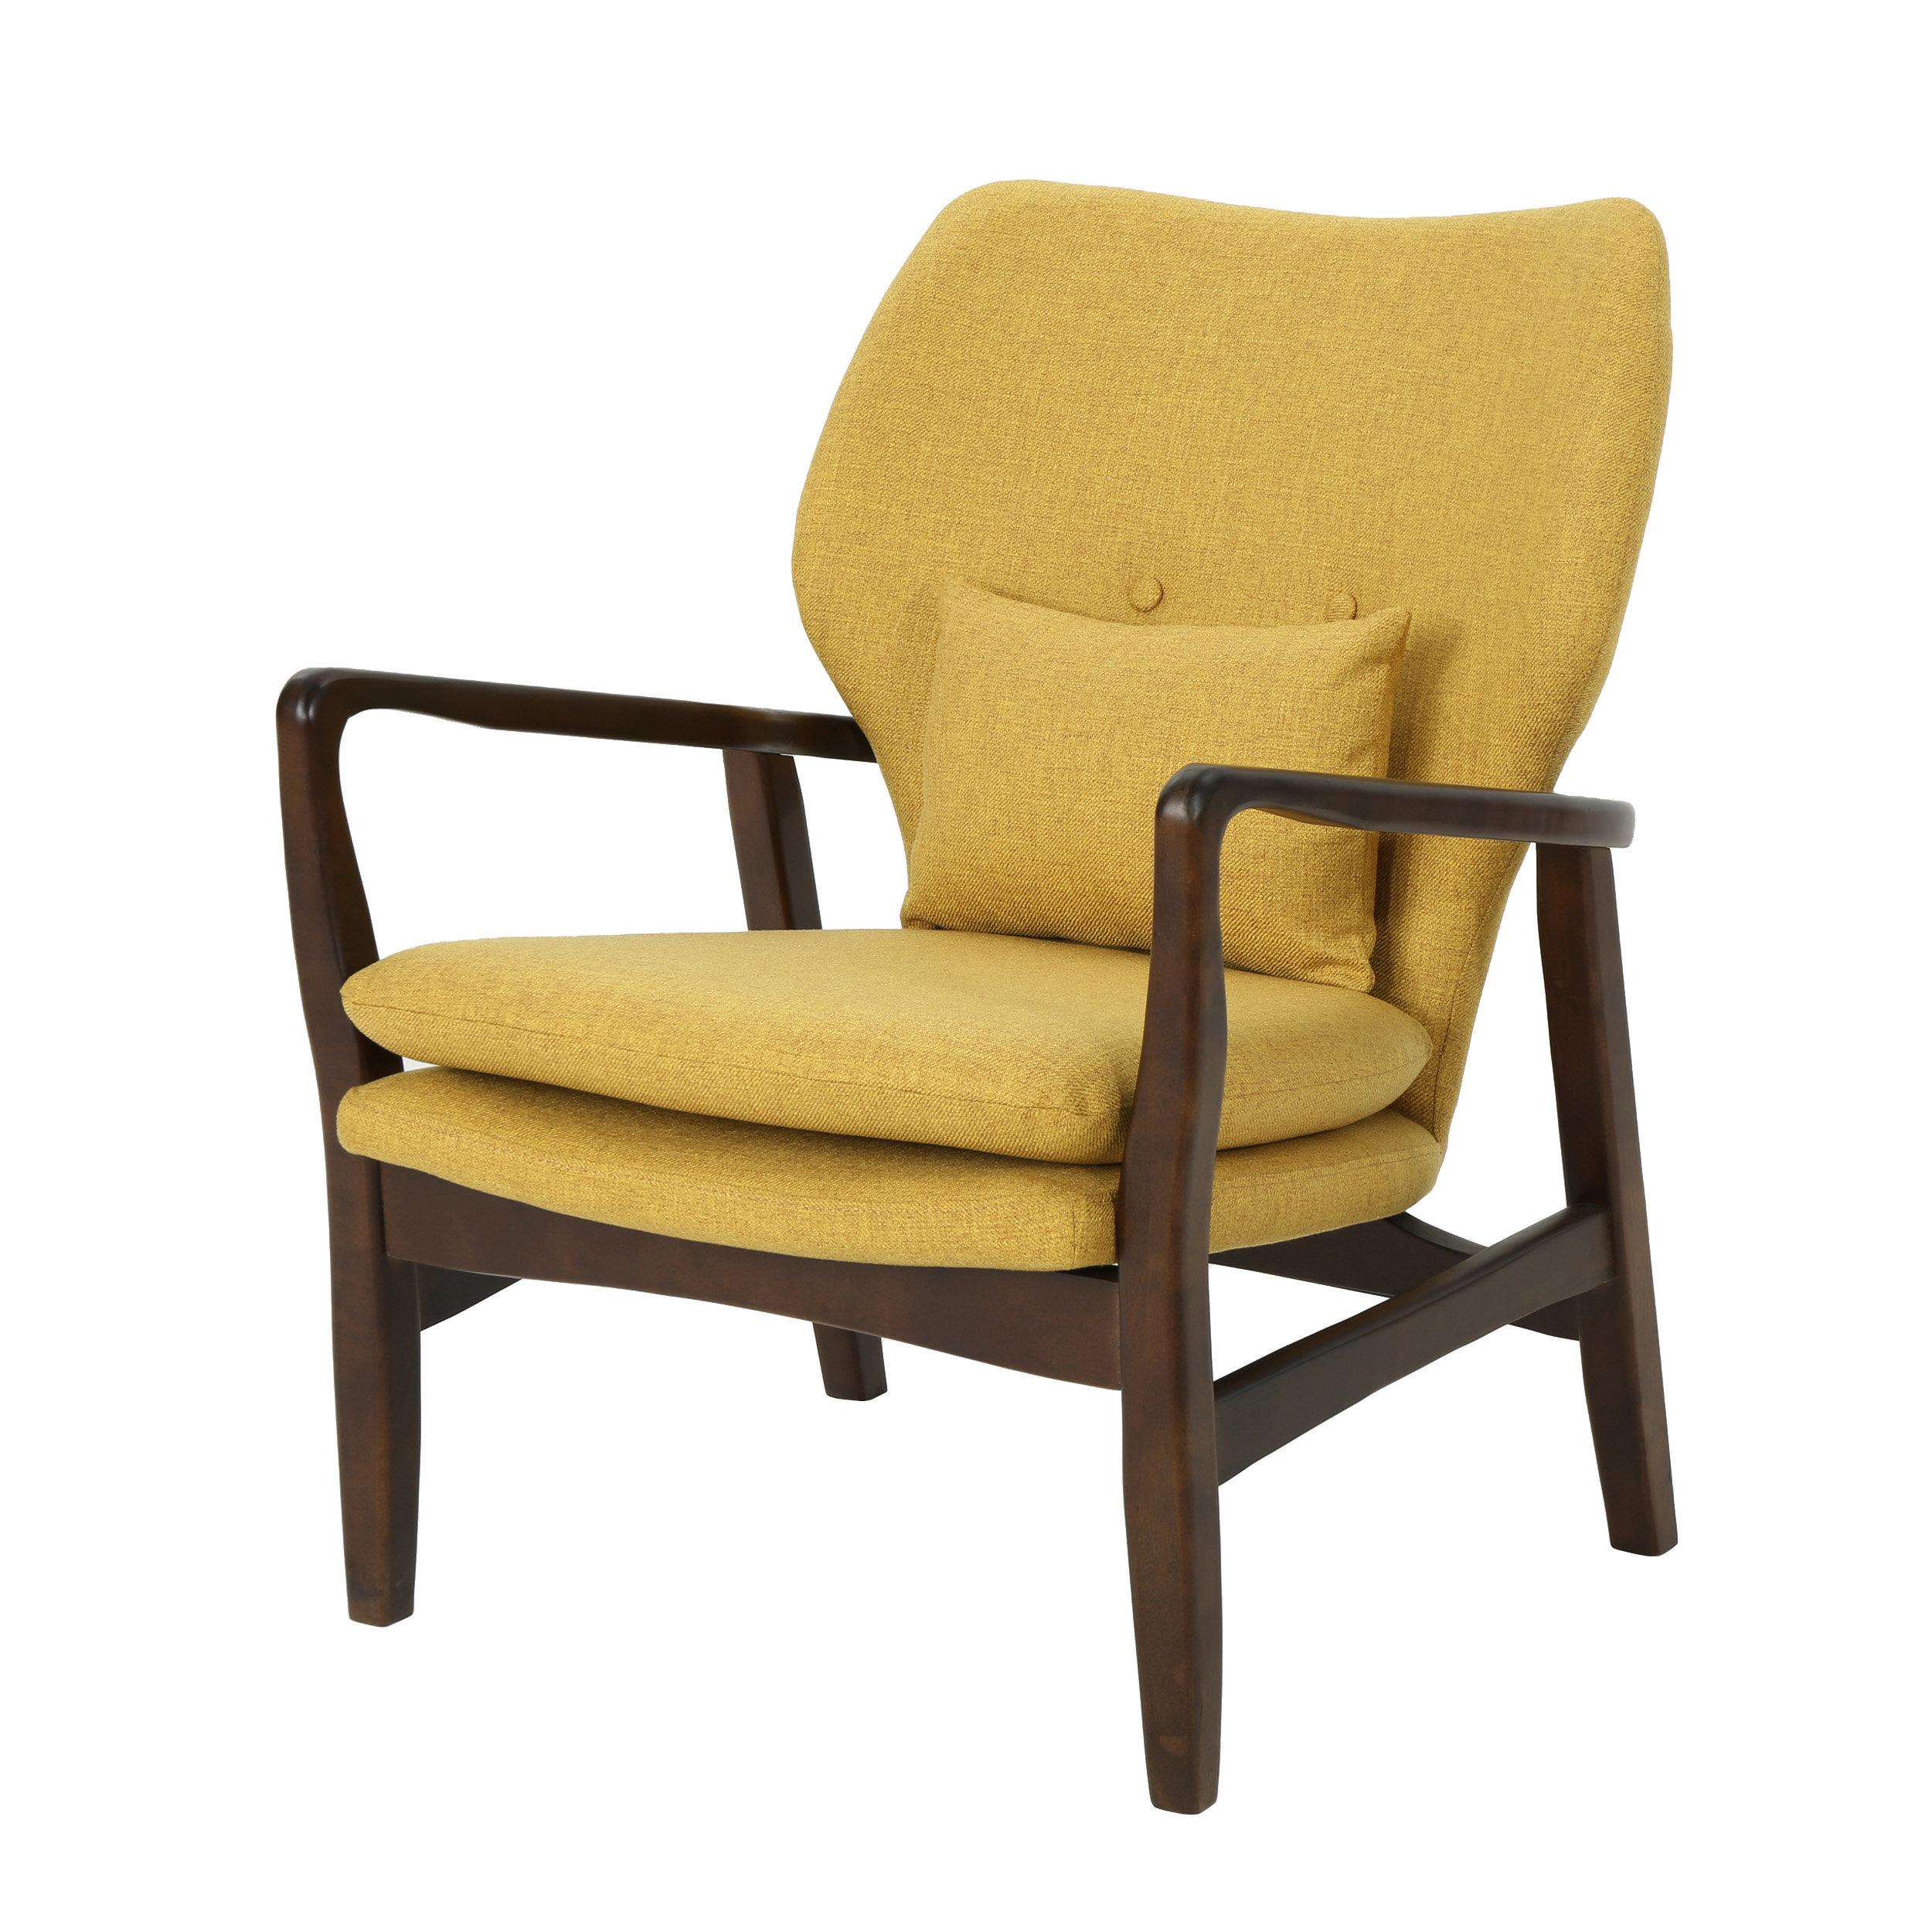 Picture of: George Oliver Regina Mid Century Modern Armchair Reviews Wayfair Co Uk